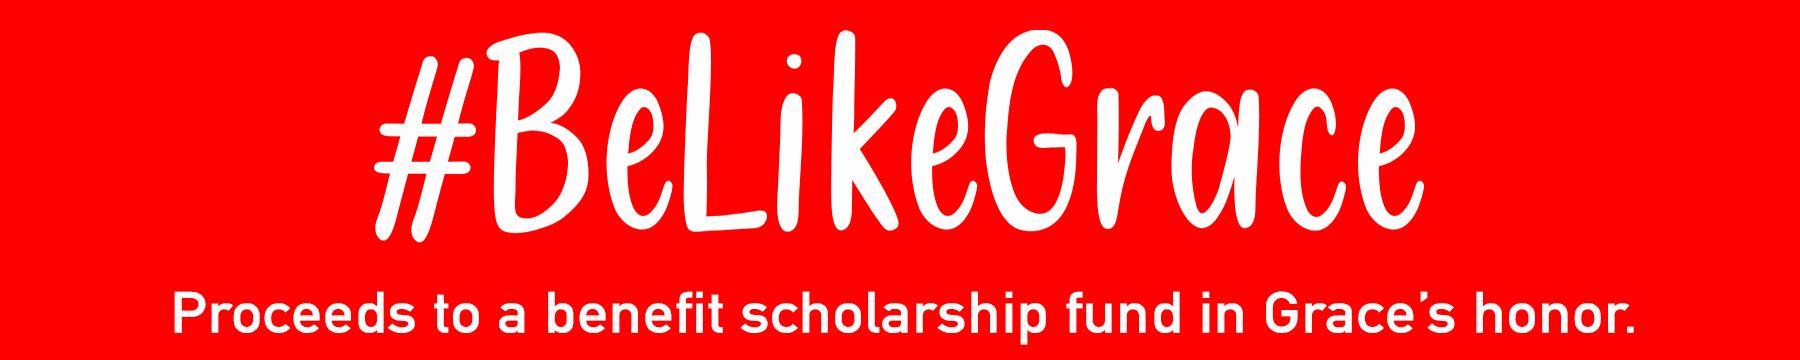 Grace Scholarship Fund banner